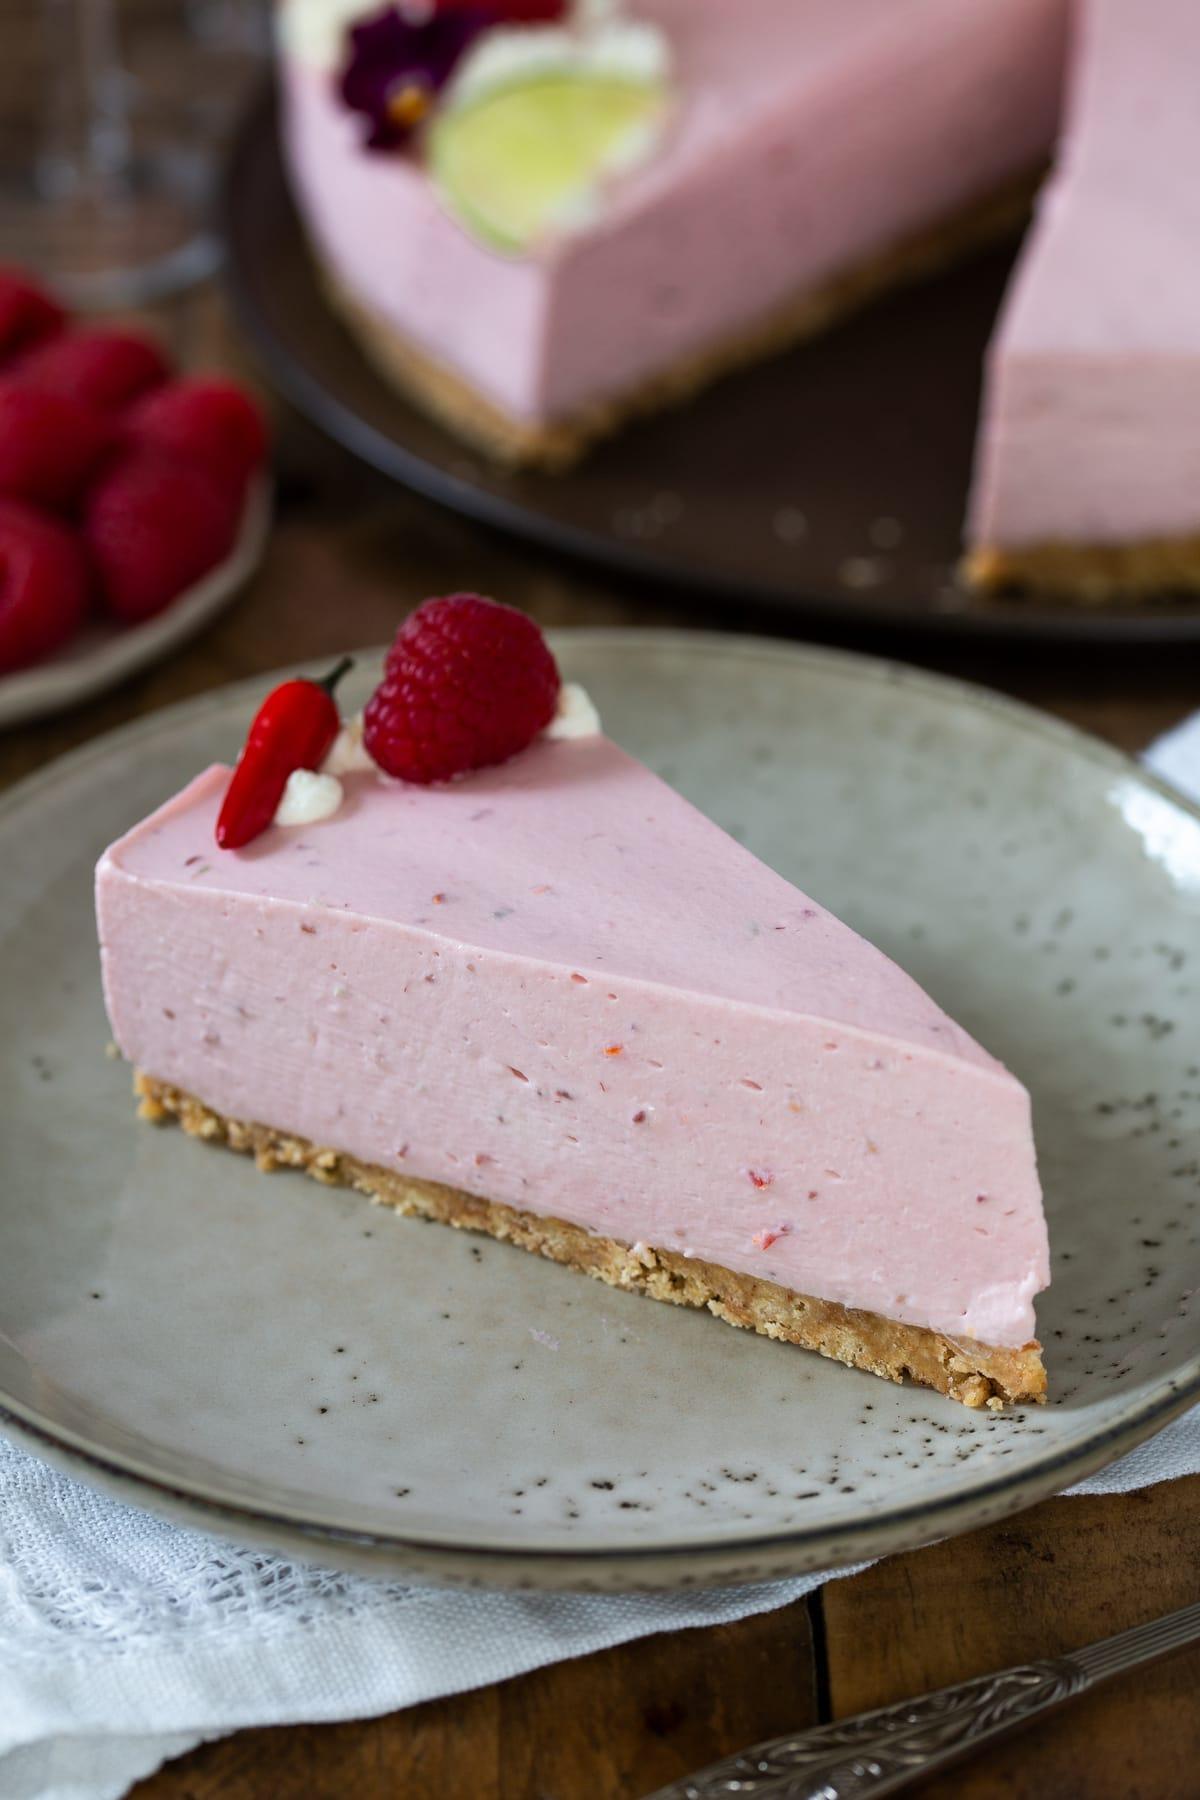 A slice of raspberry cheesecake on a beige plate.